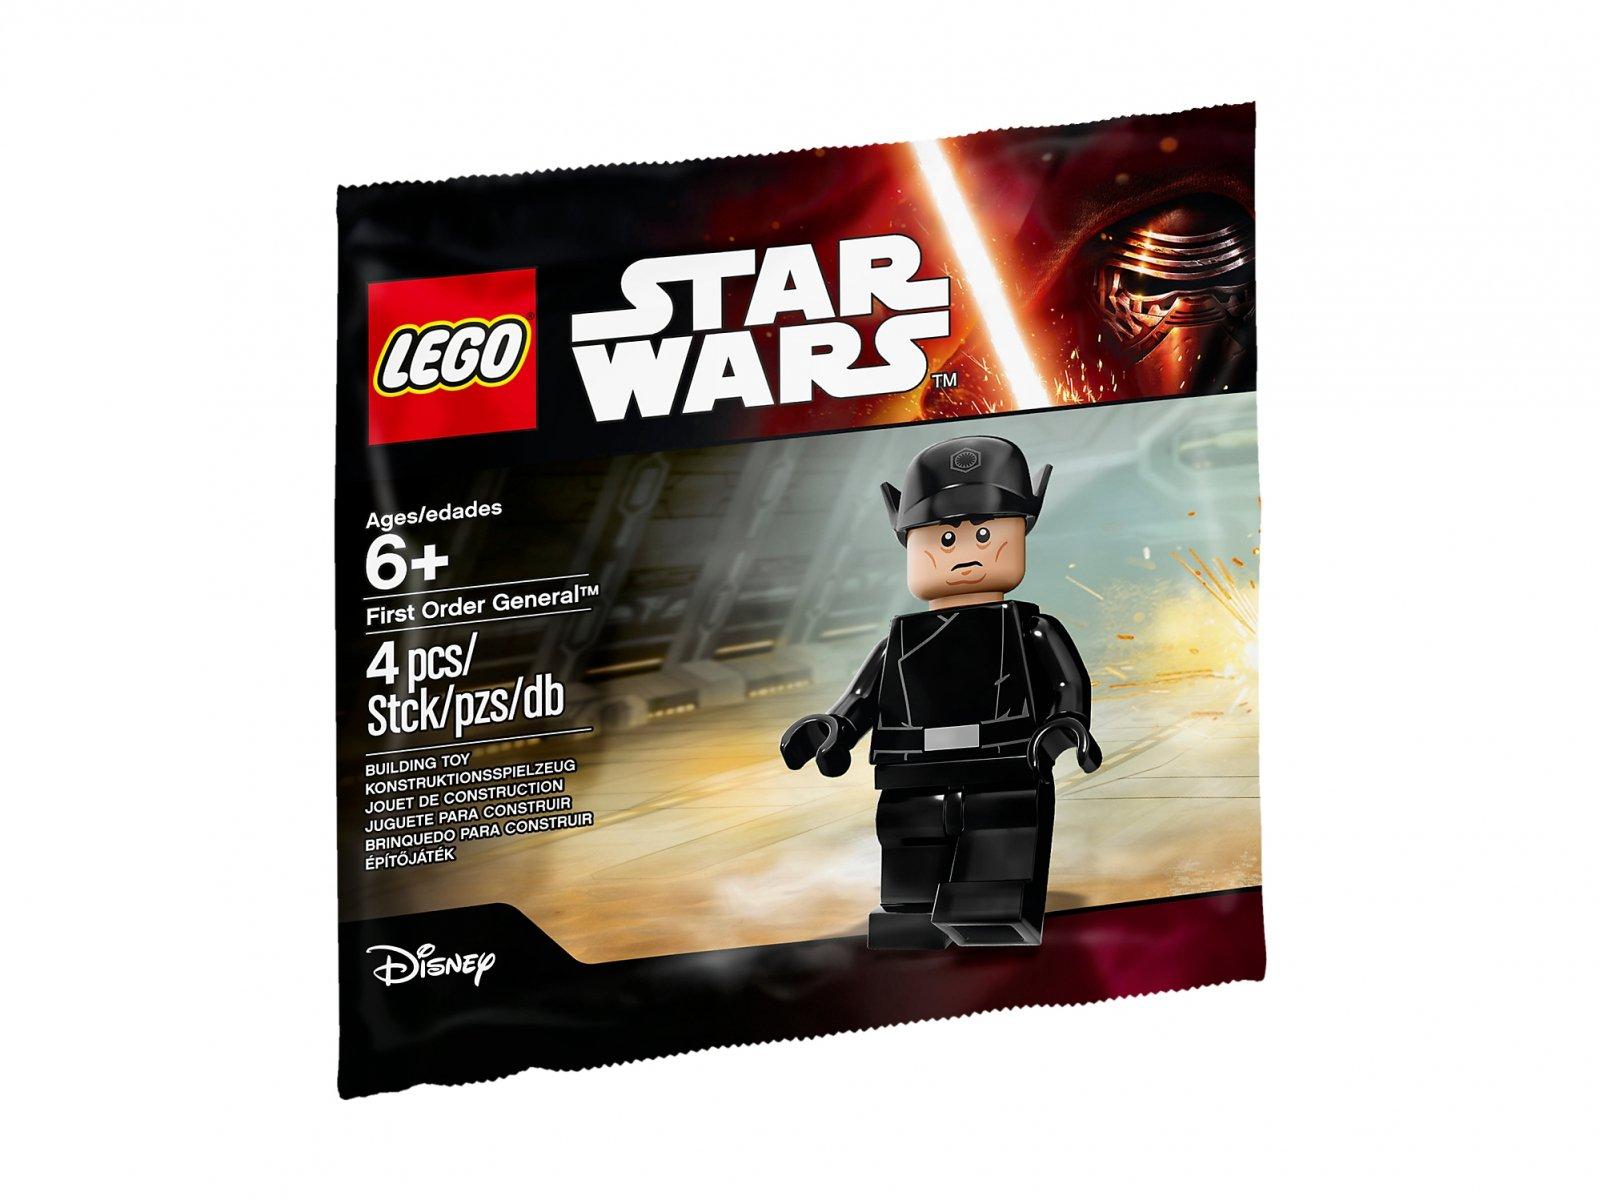 LEGO Star Wars™ First Order General™